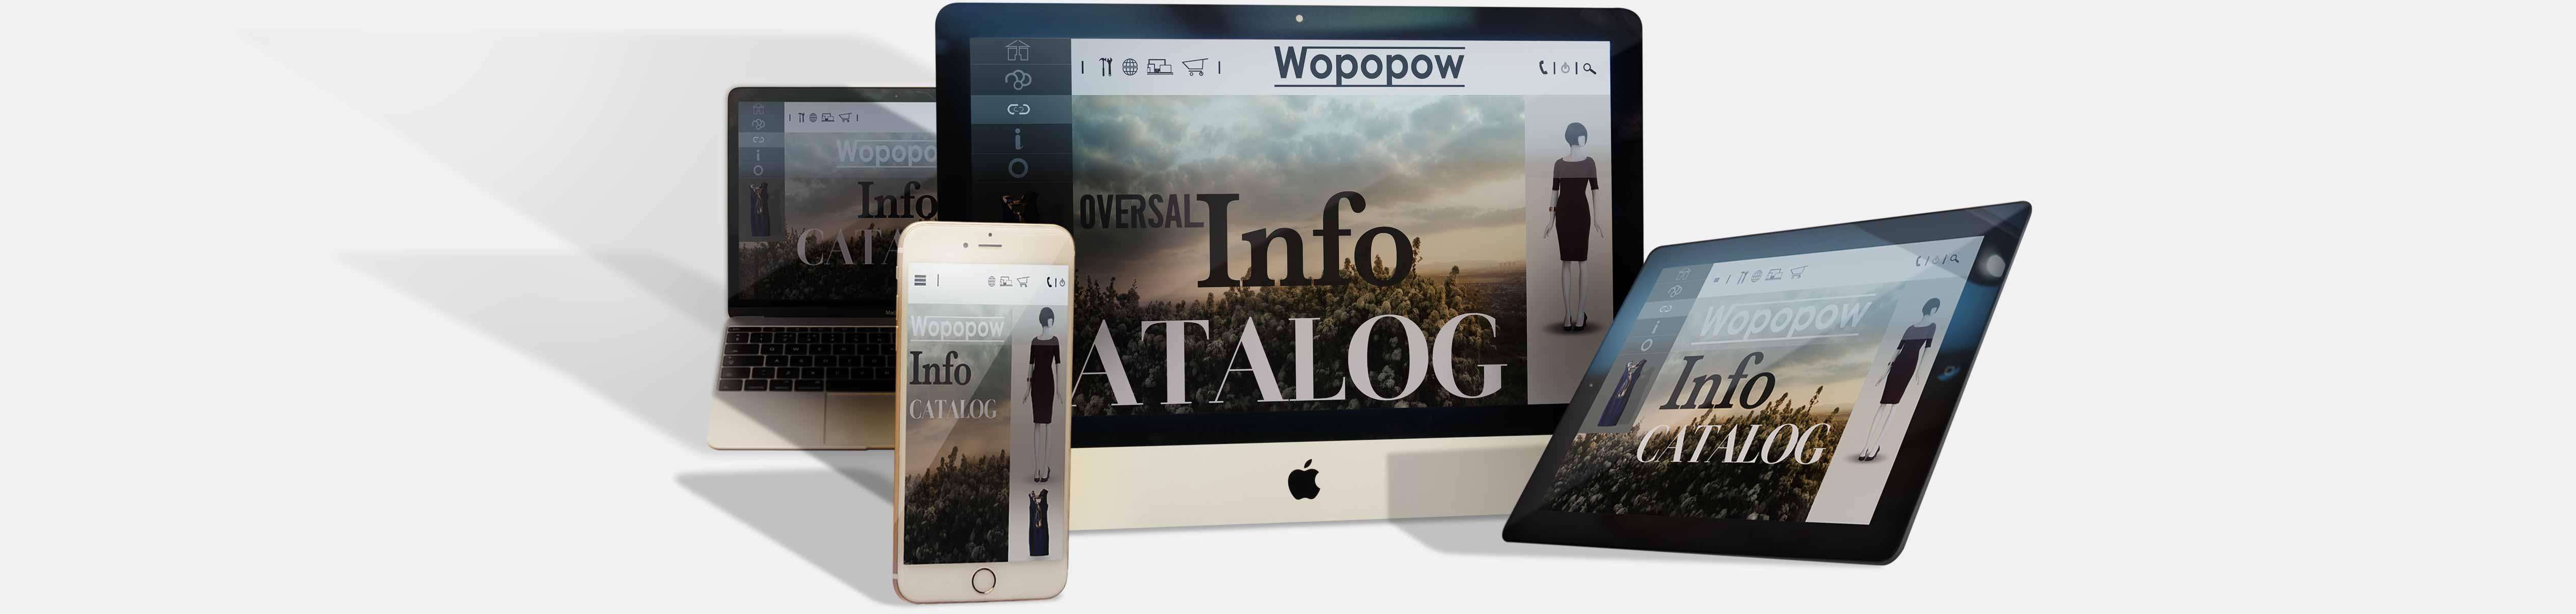 iPhone tablet laptop and desktop showing Oversal responsive web design capabilities